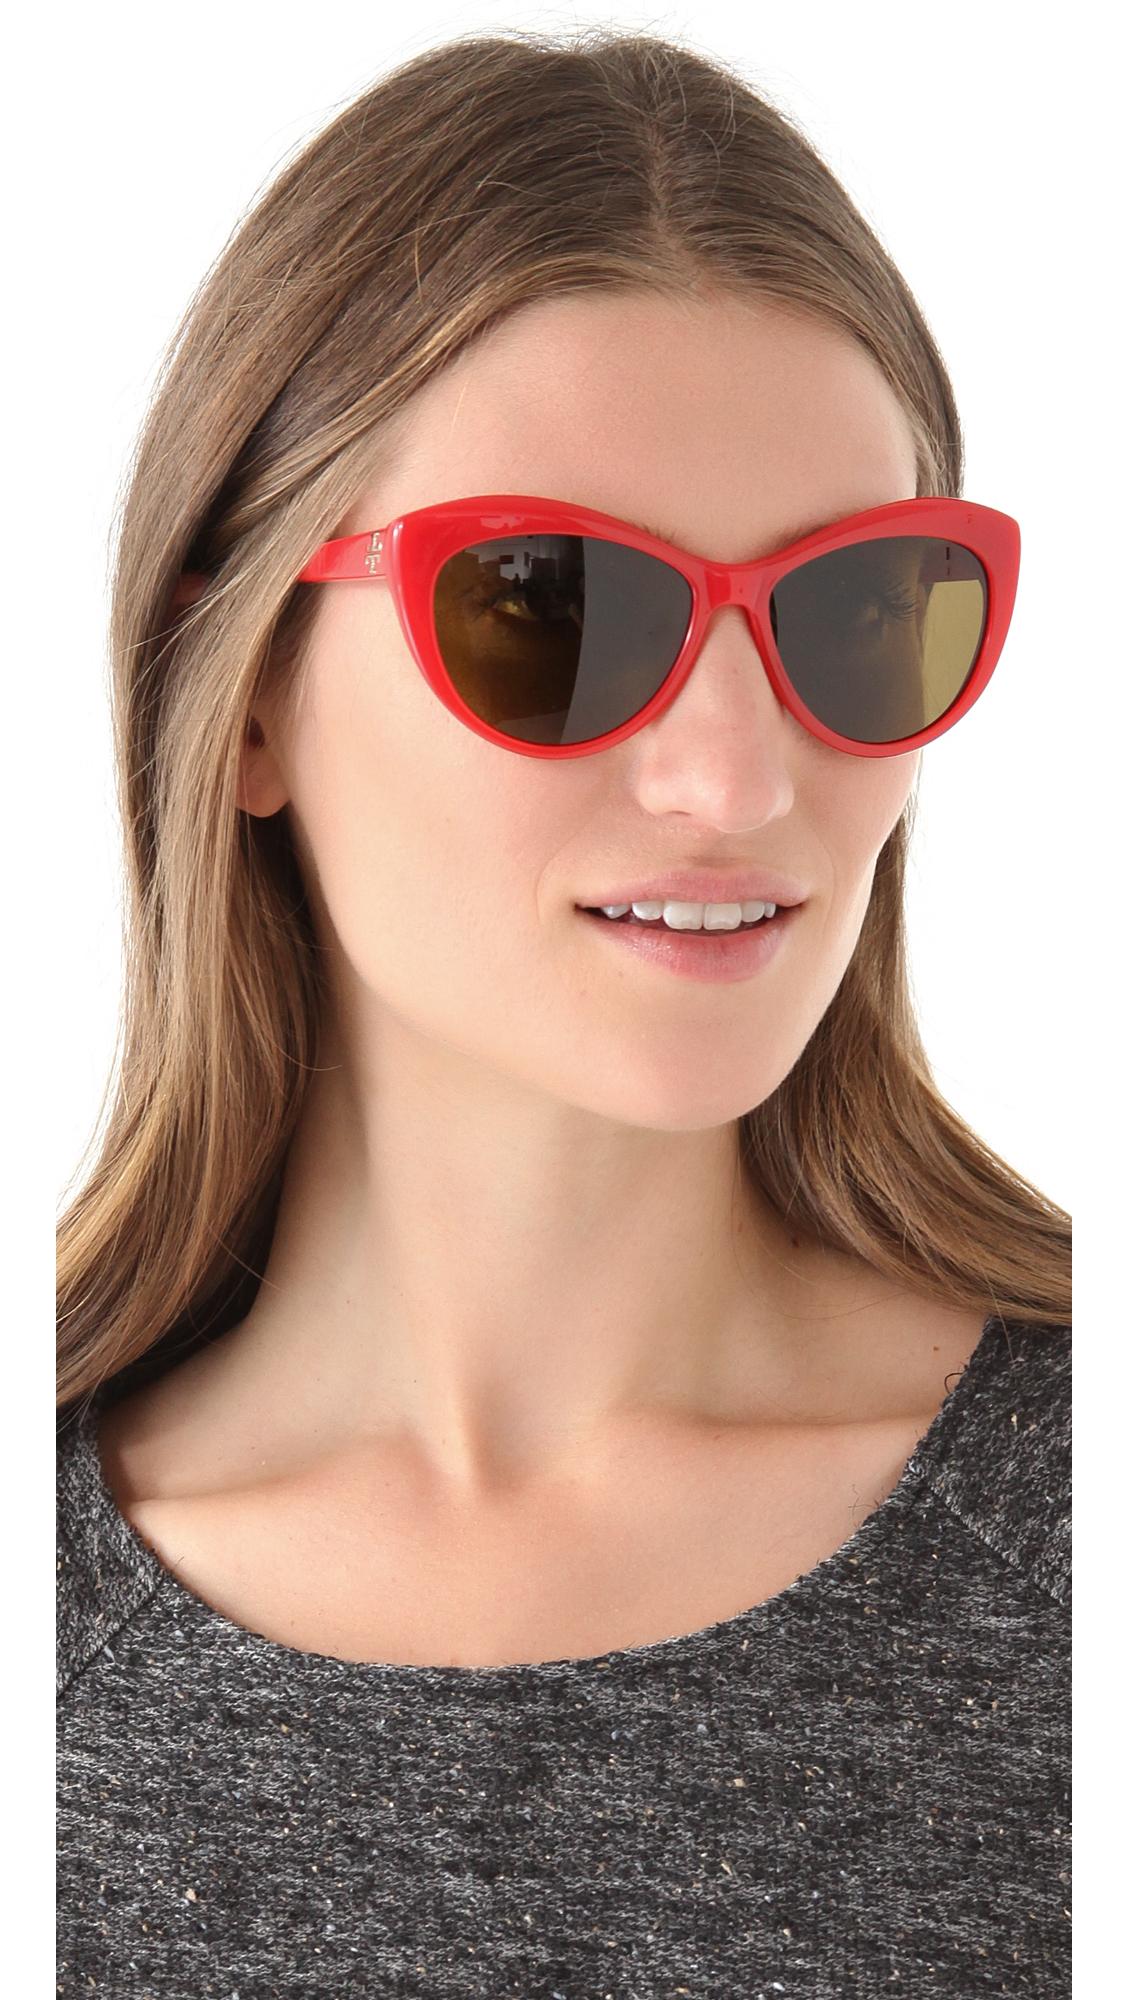 475a3d3cbb1 Tory Burch Oversized Cat Eye Sunglasses